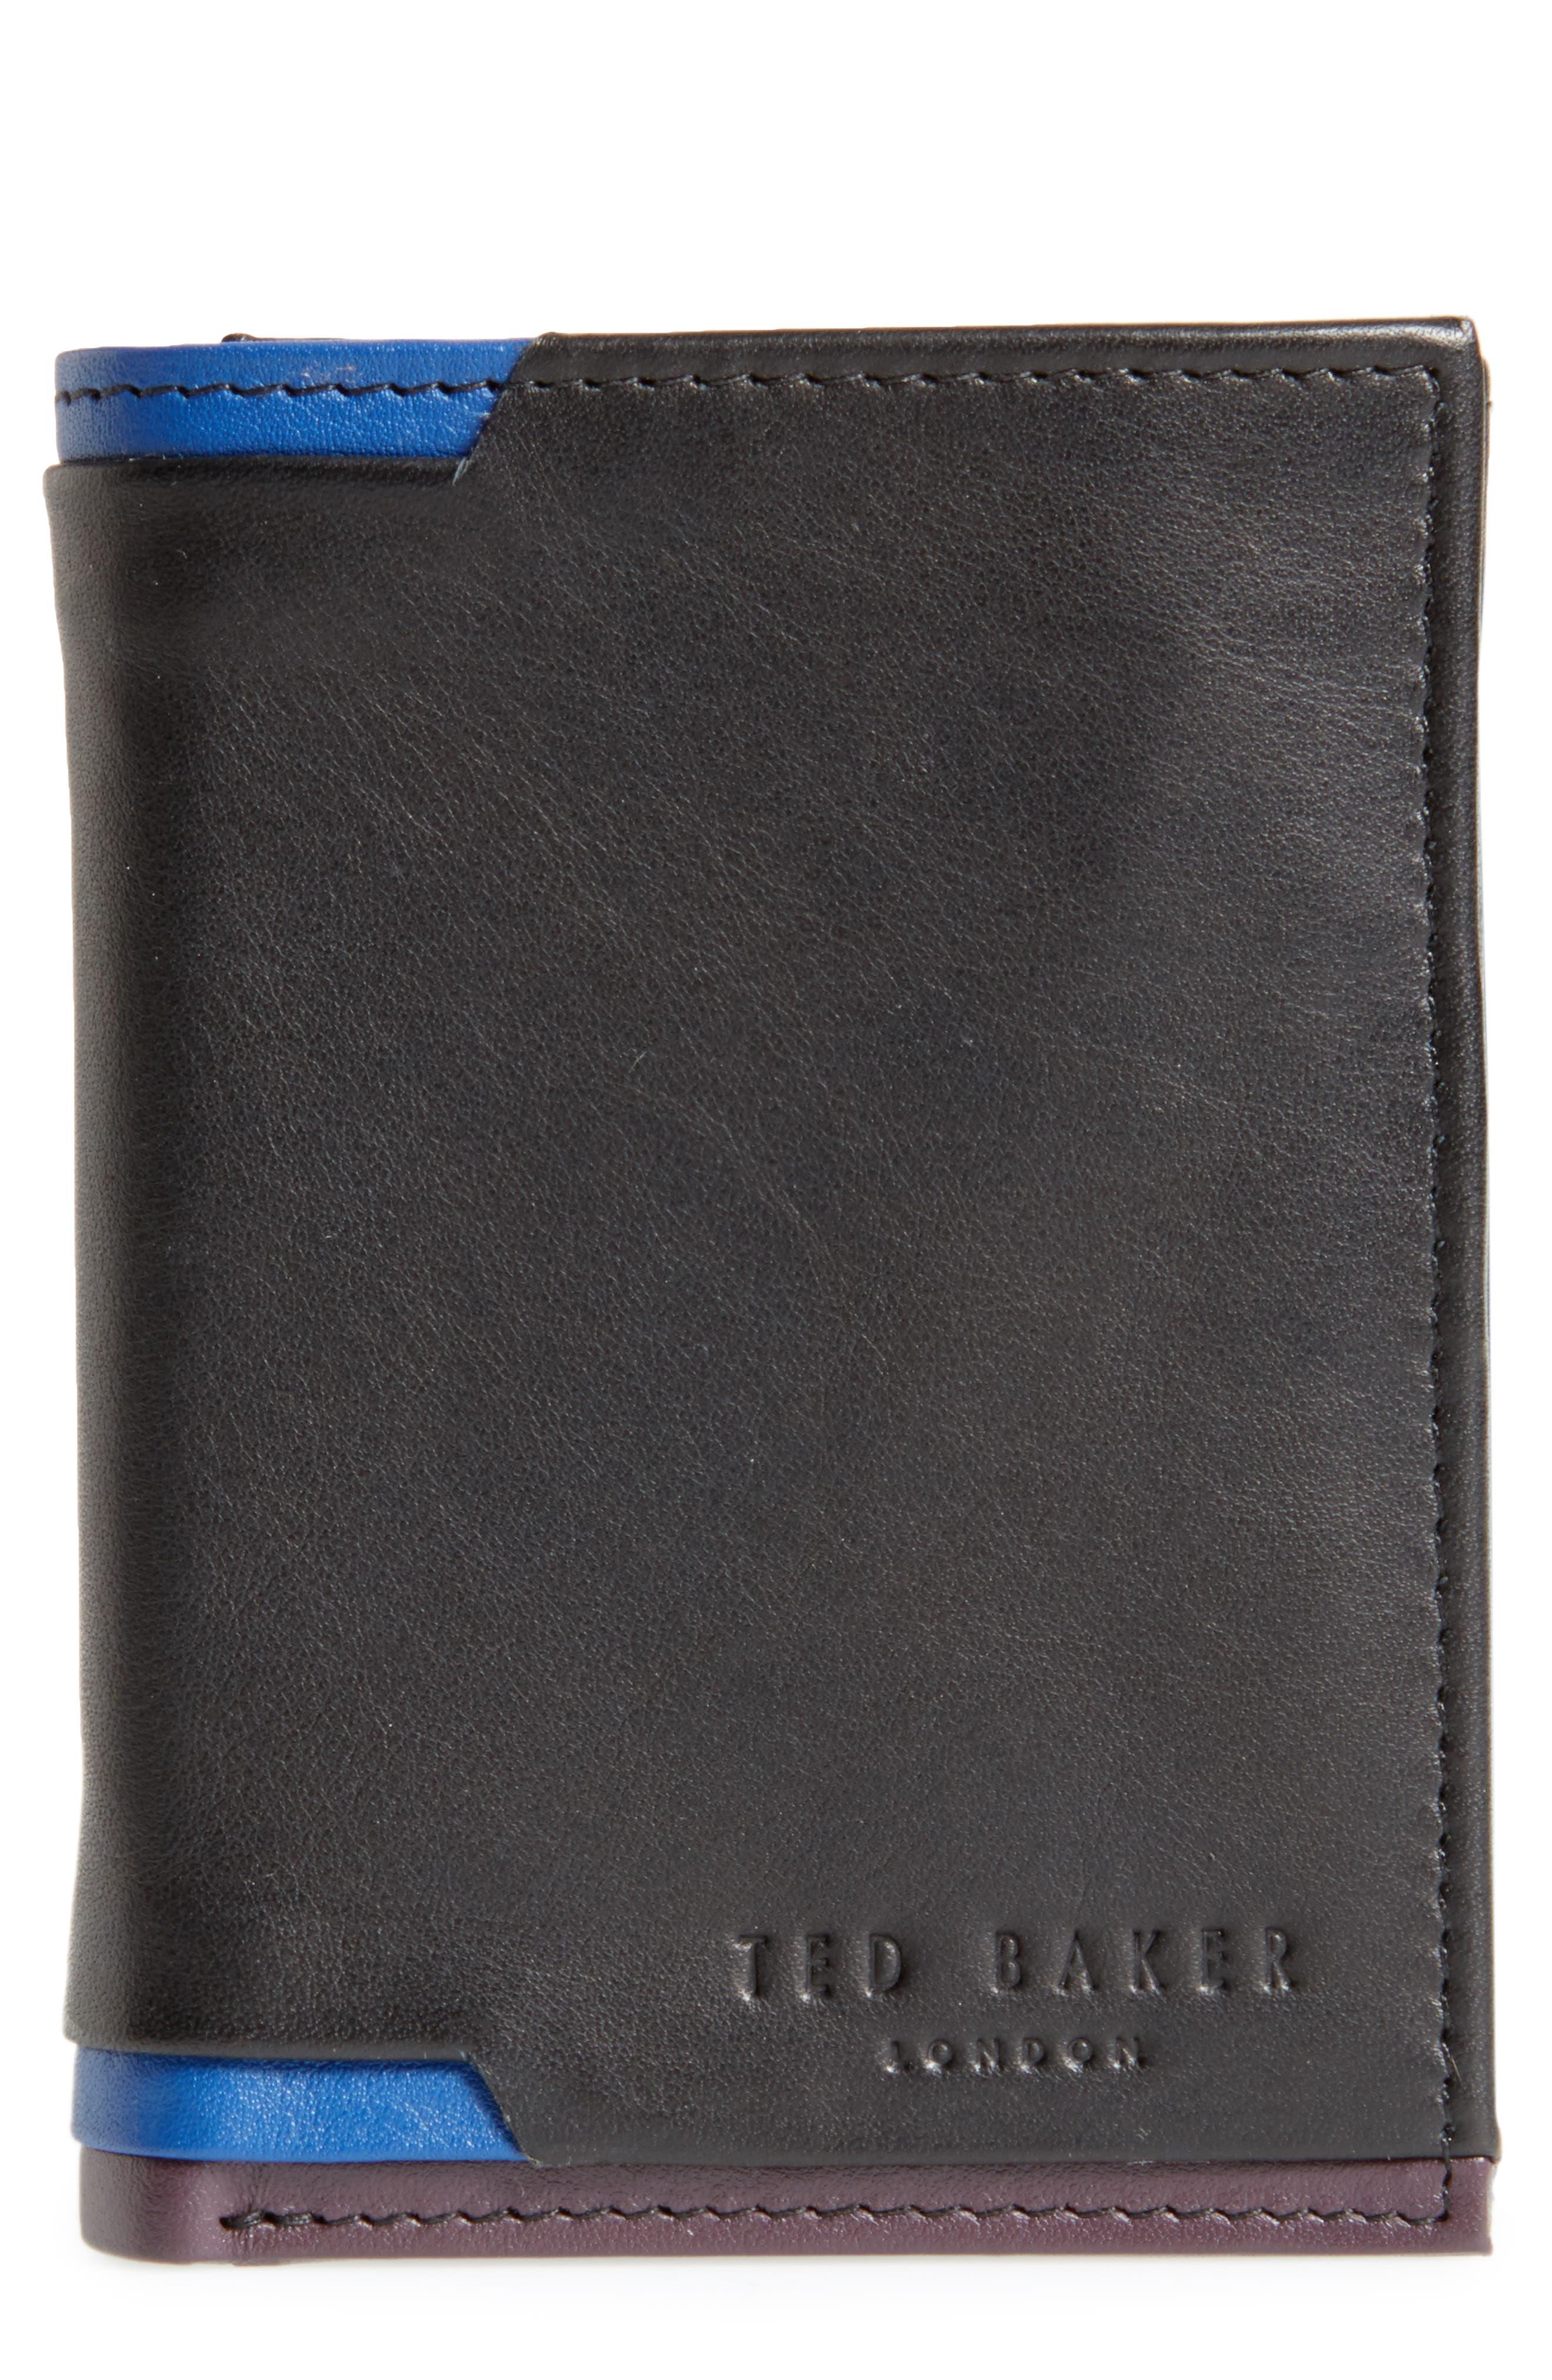 Vien Corner Detail Trifold Leather Wallet,                         Main,                         color, 001